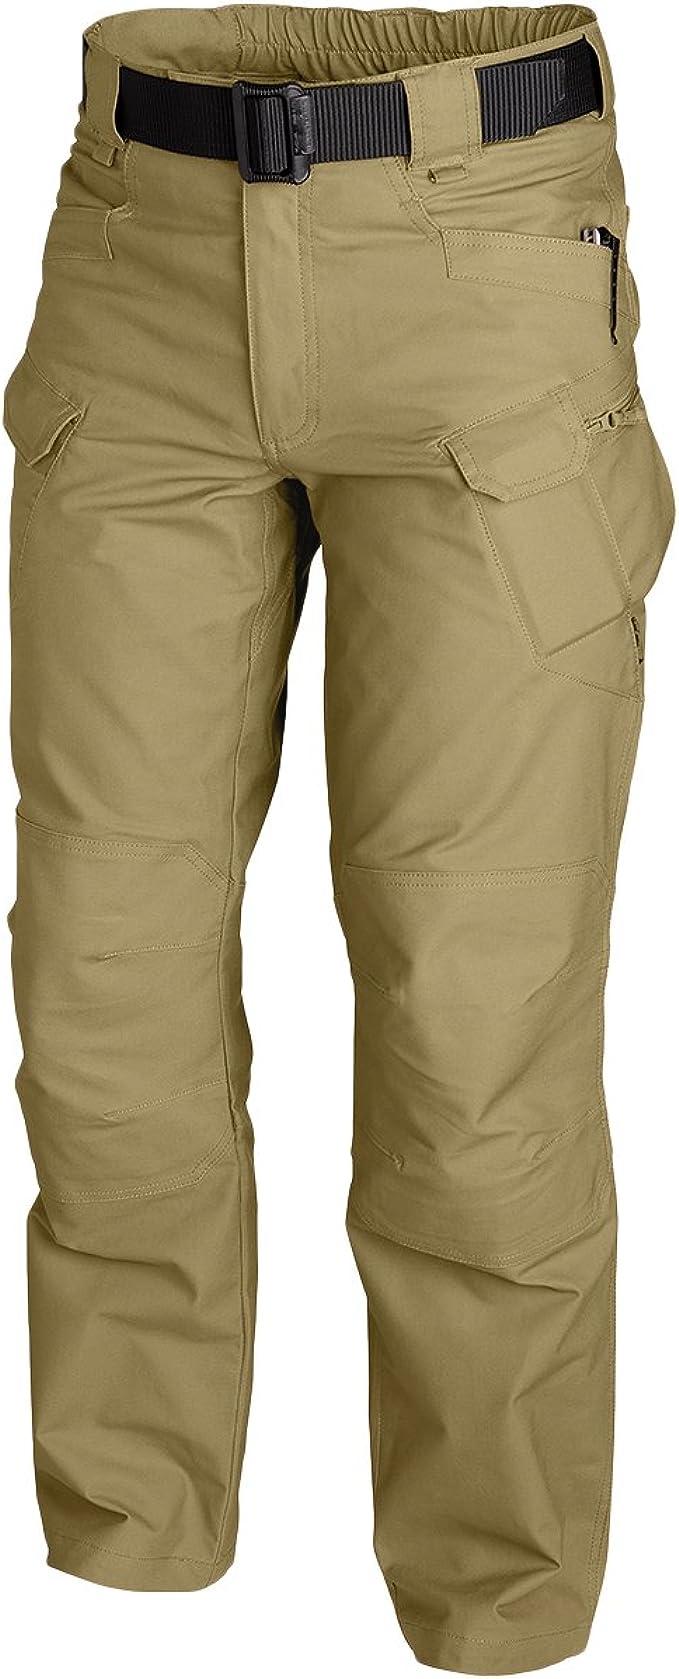 Helikon-Tex GTP Greyman Tactical Pants Urban Line